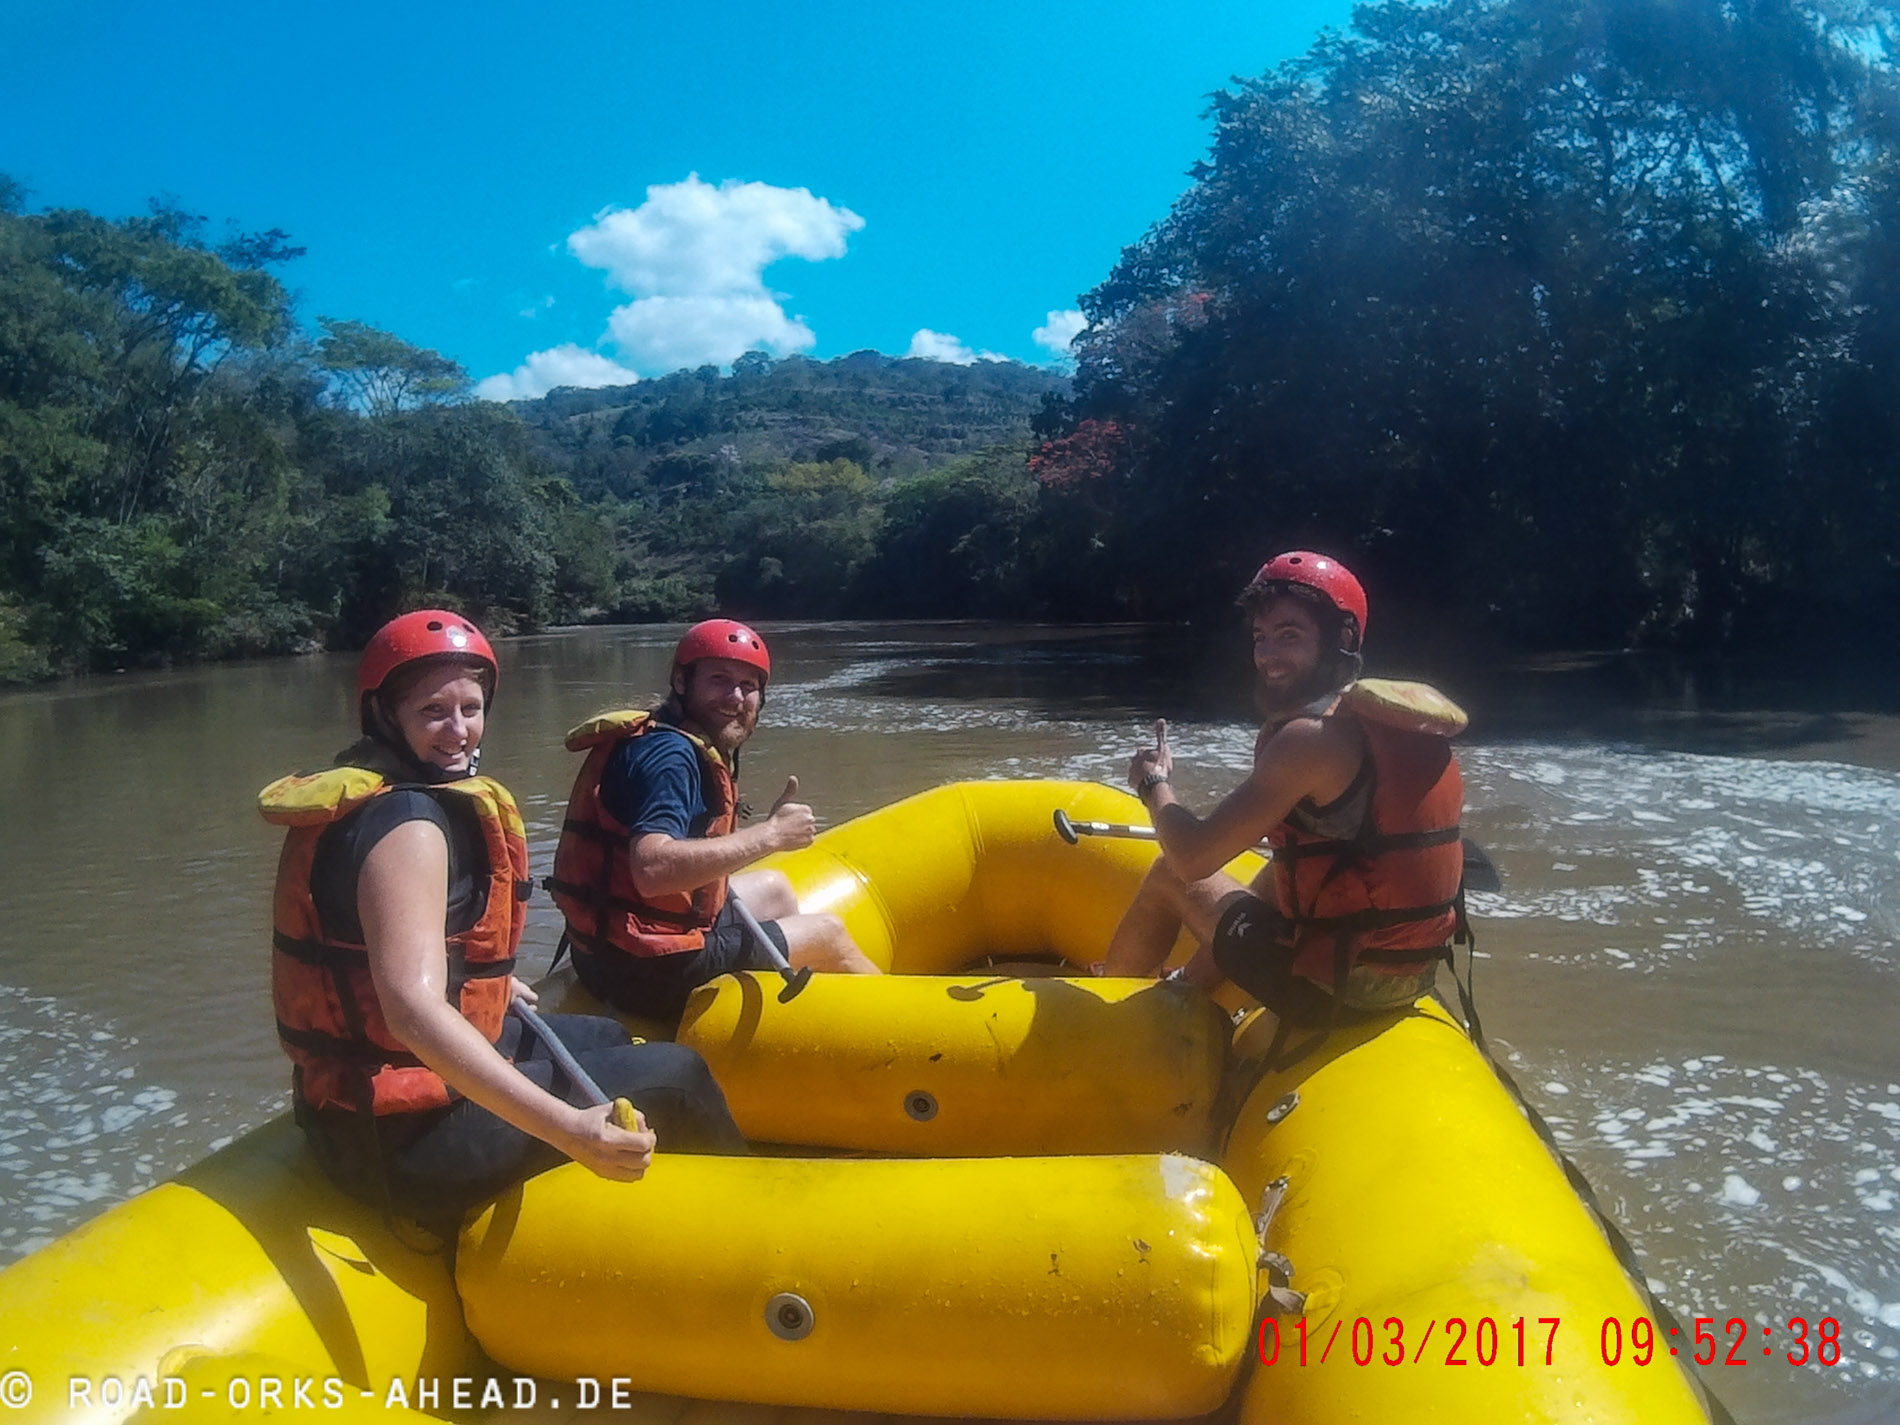 Rafting zu dritt, ok mit Guide